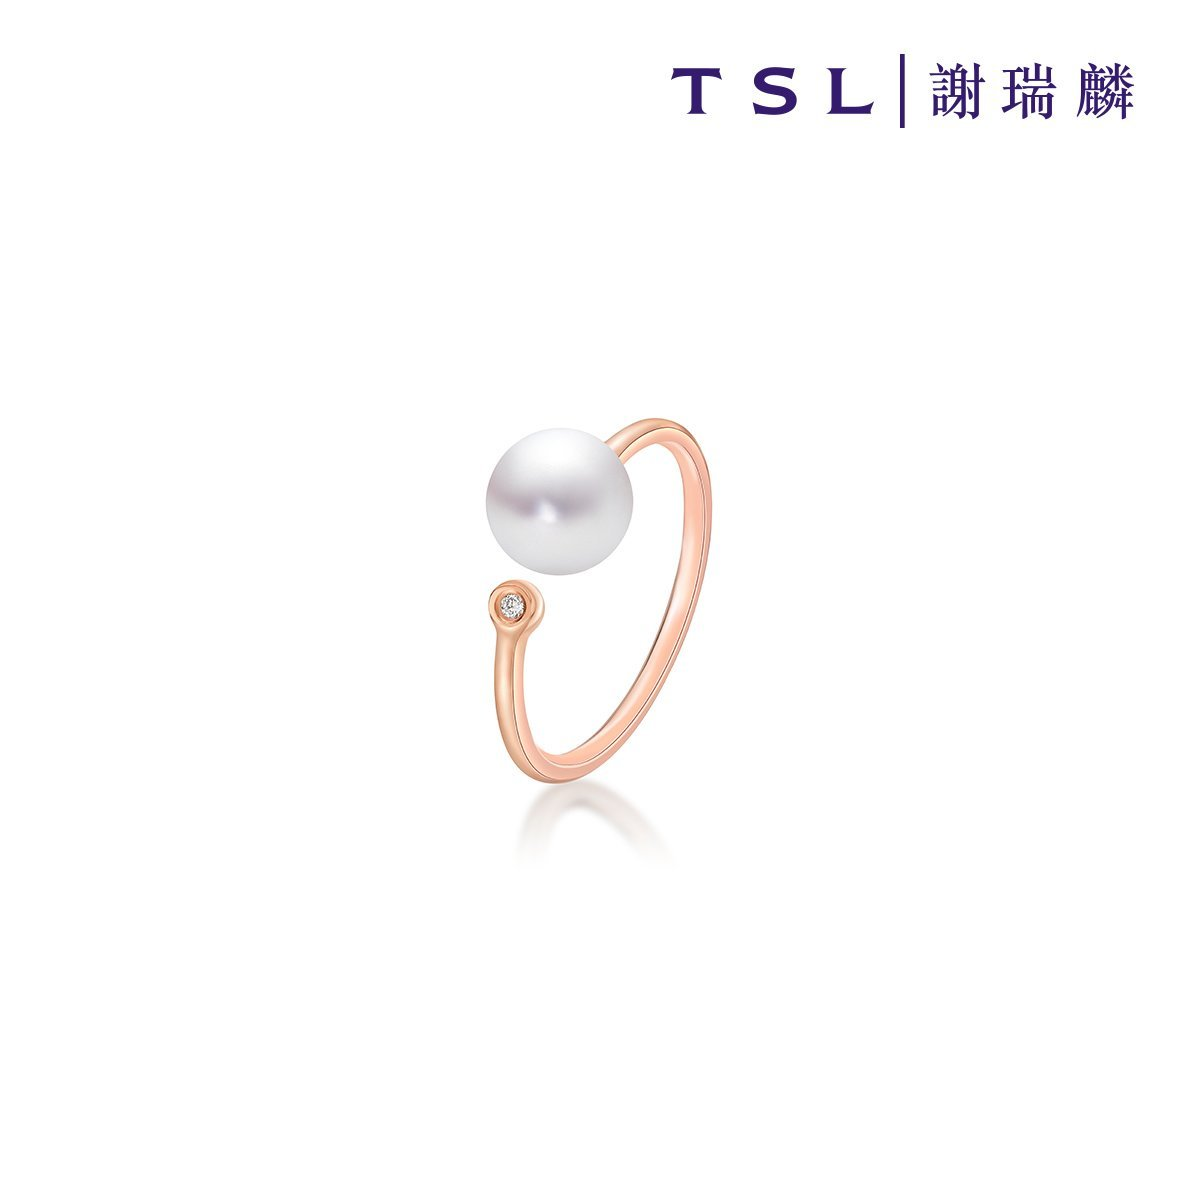 18K Rose Gold Pearl Ring